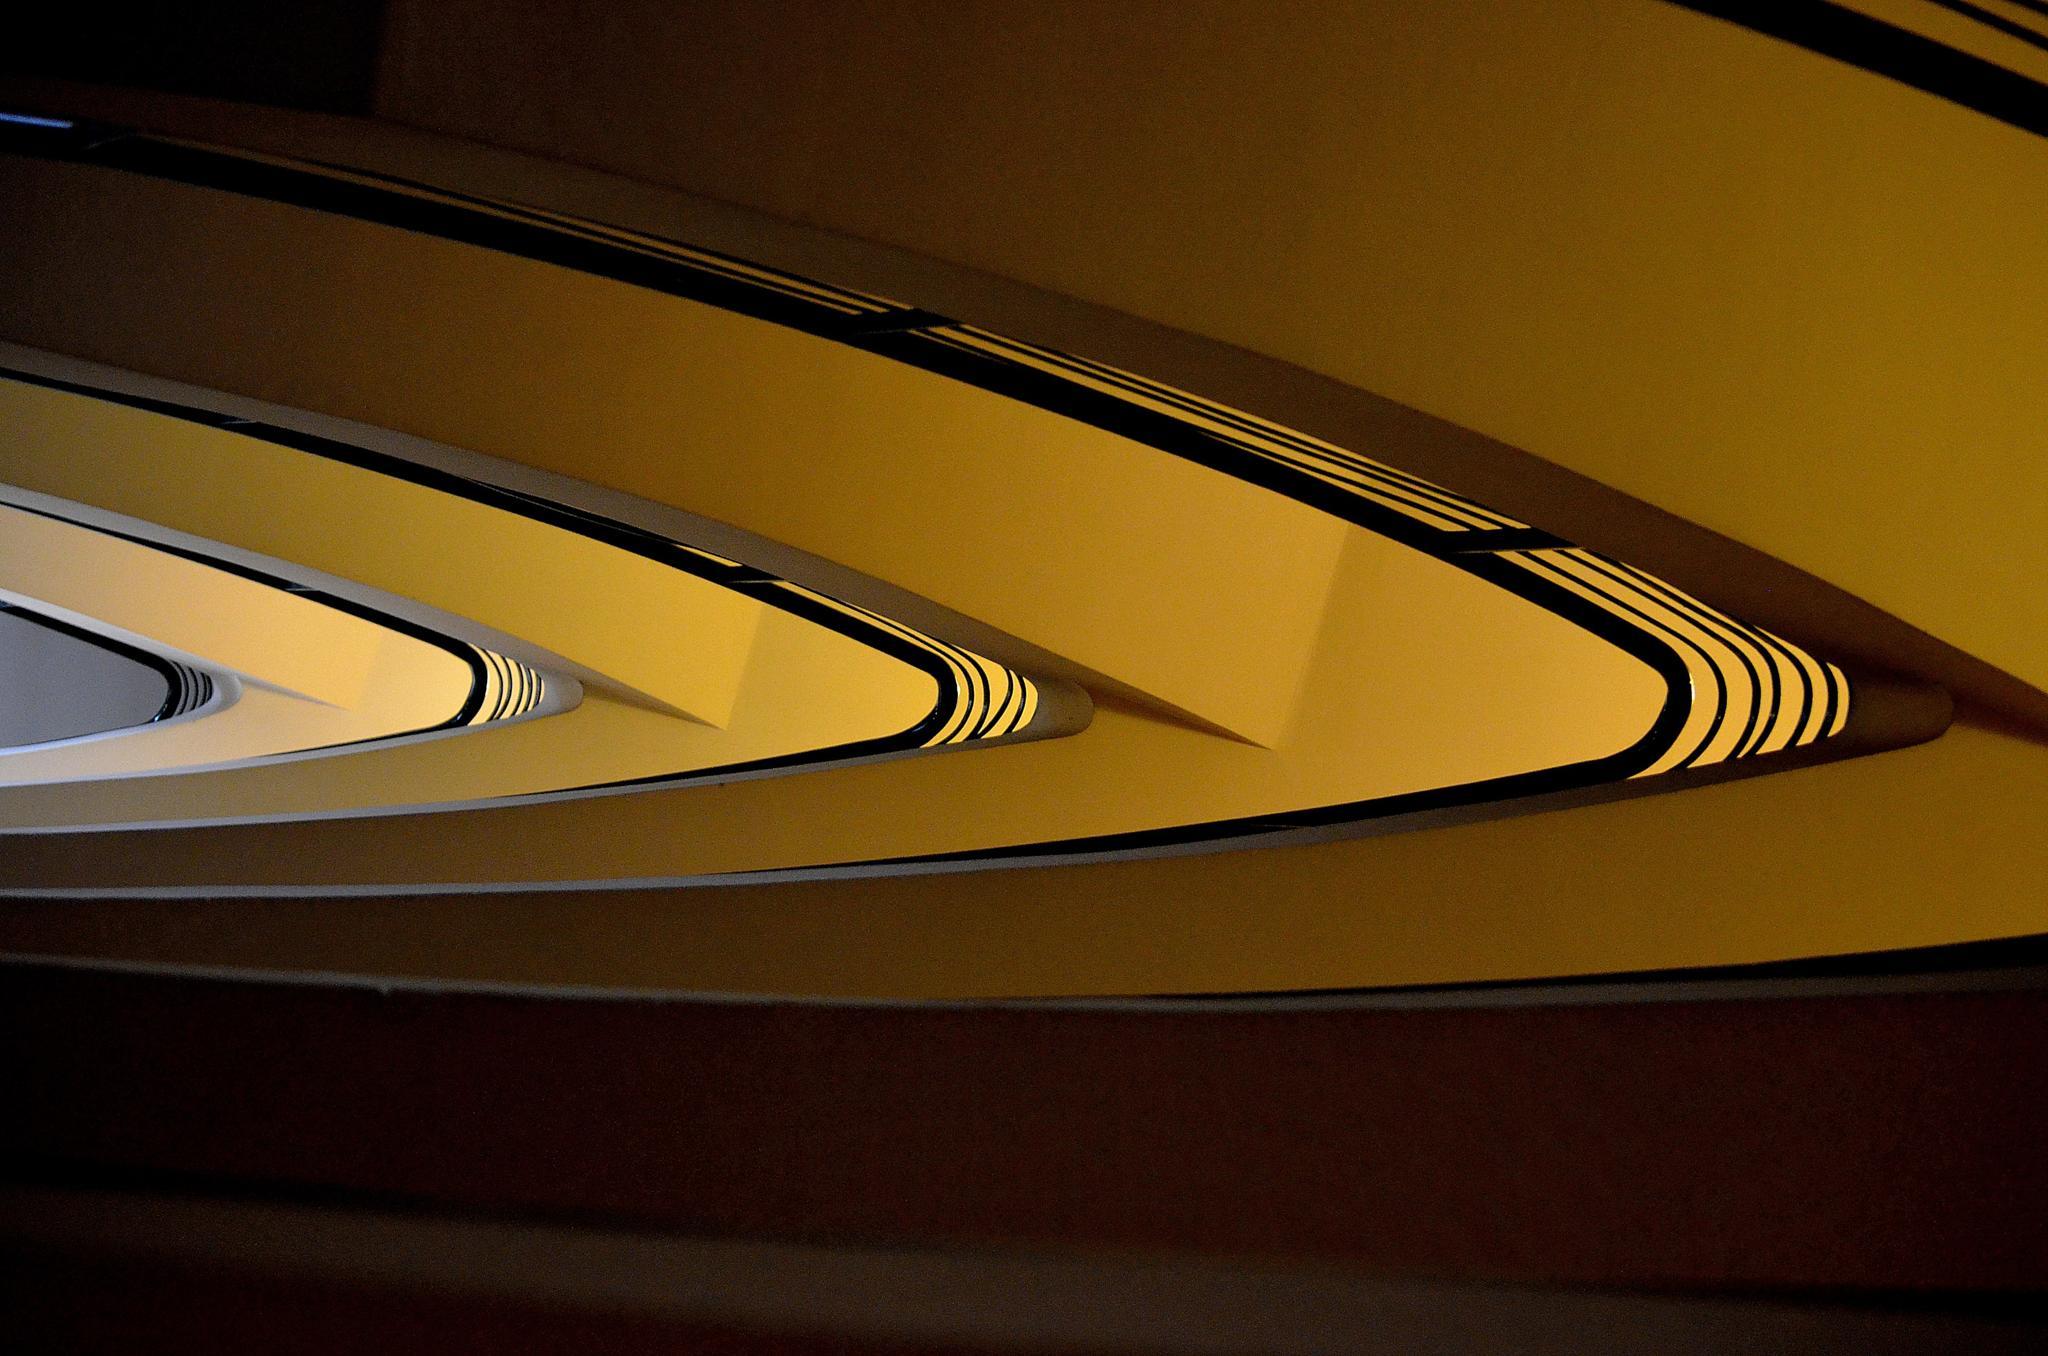 Stairs by EnricoSortinoFotografia